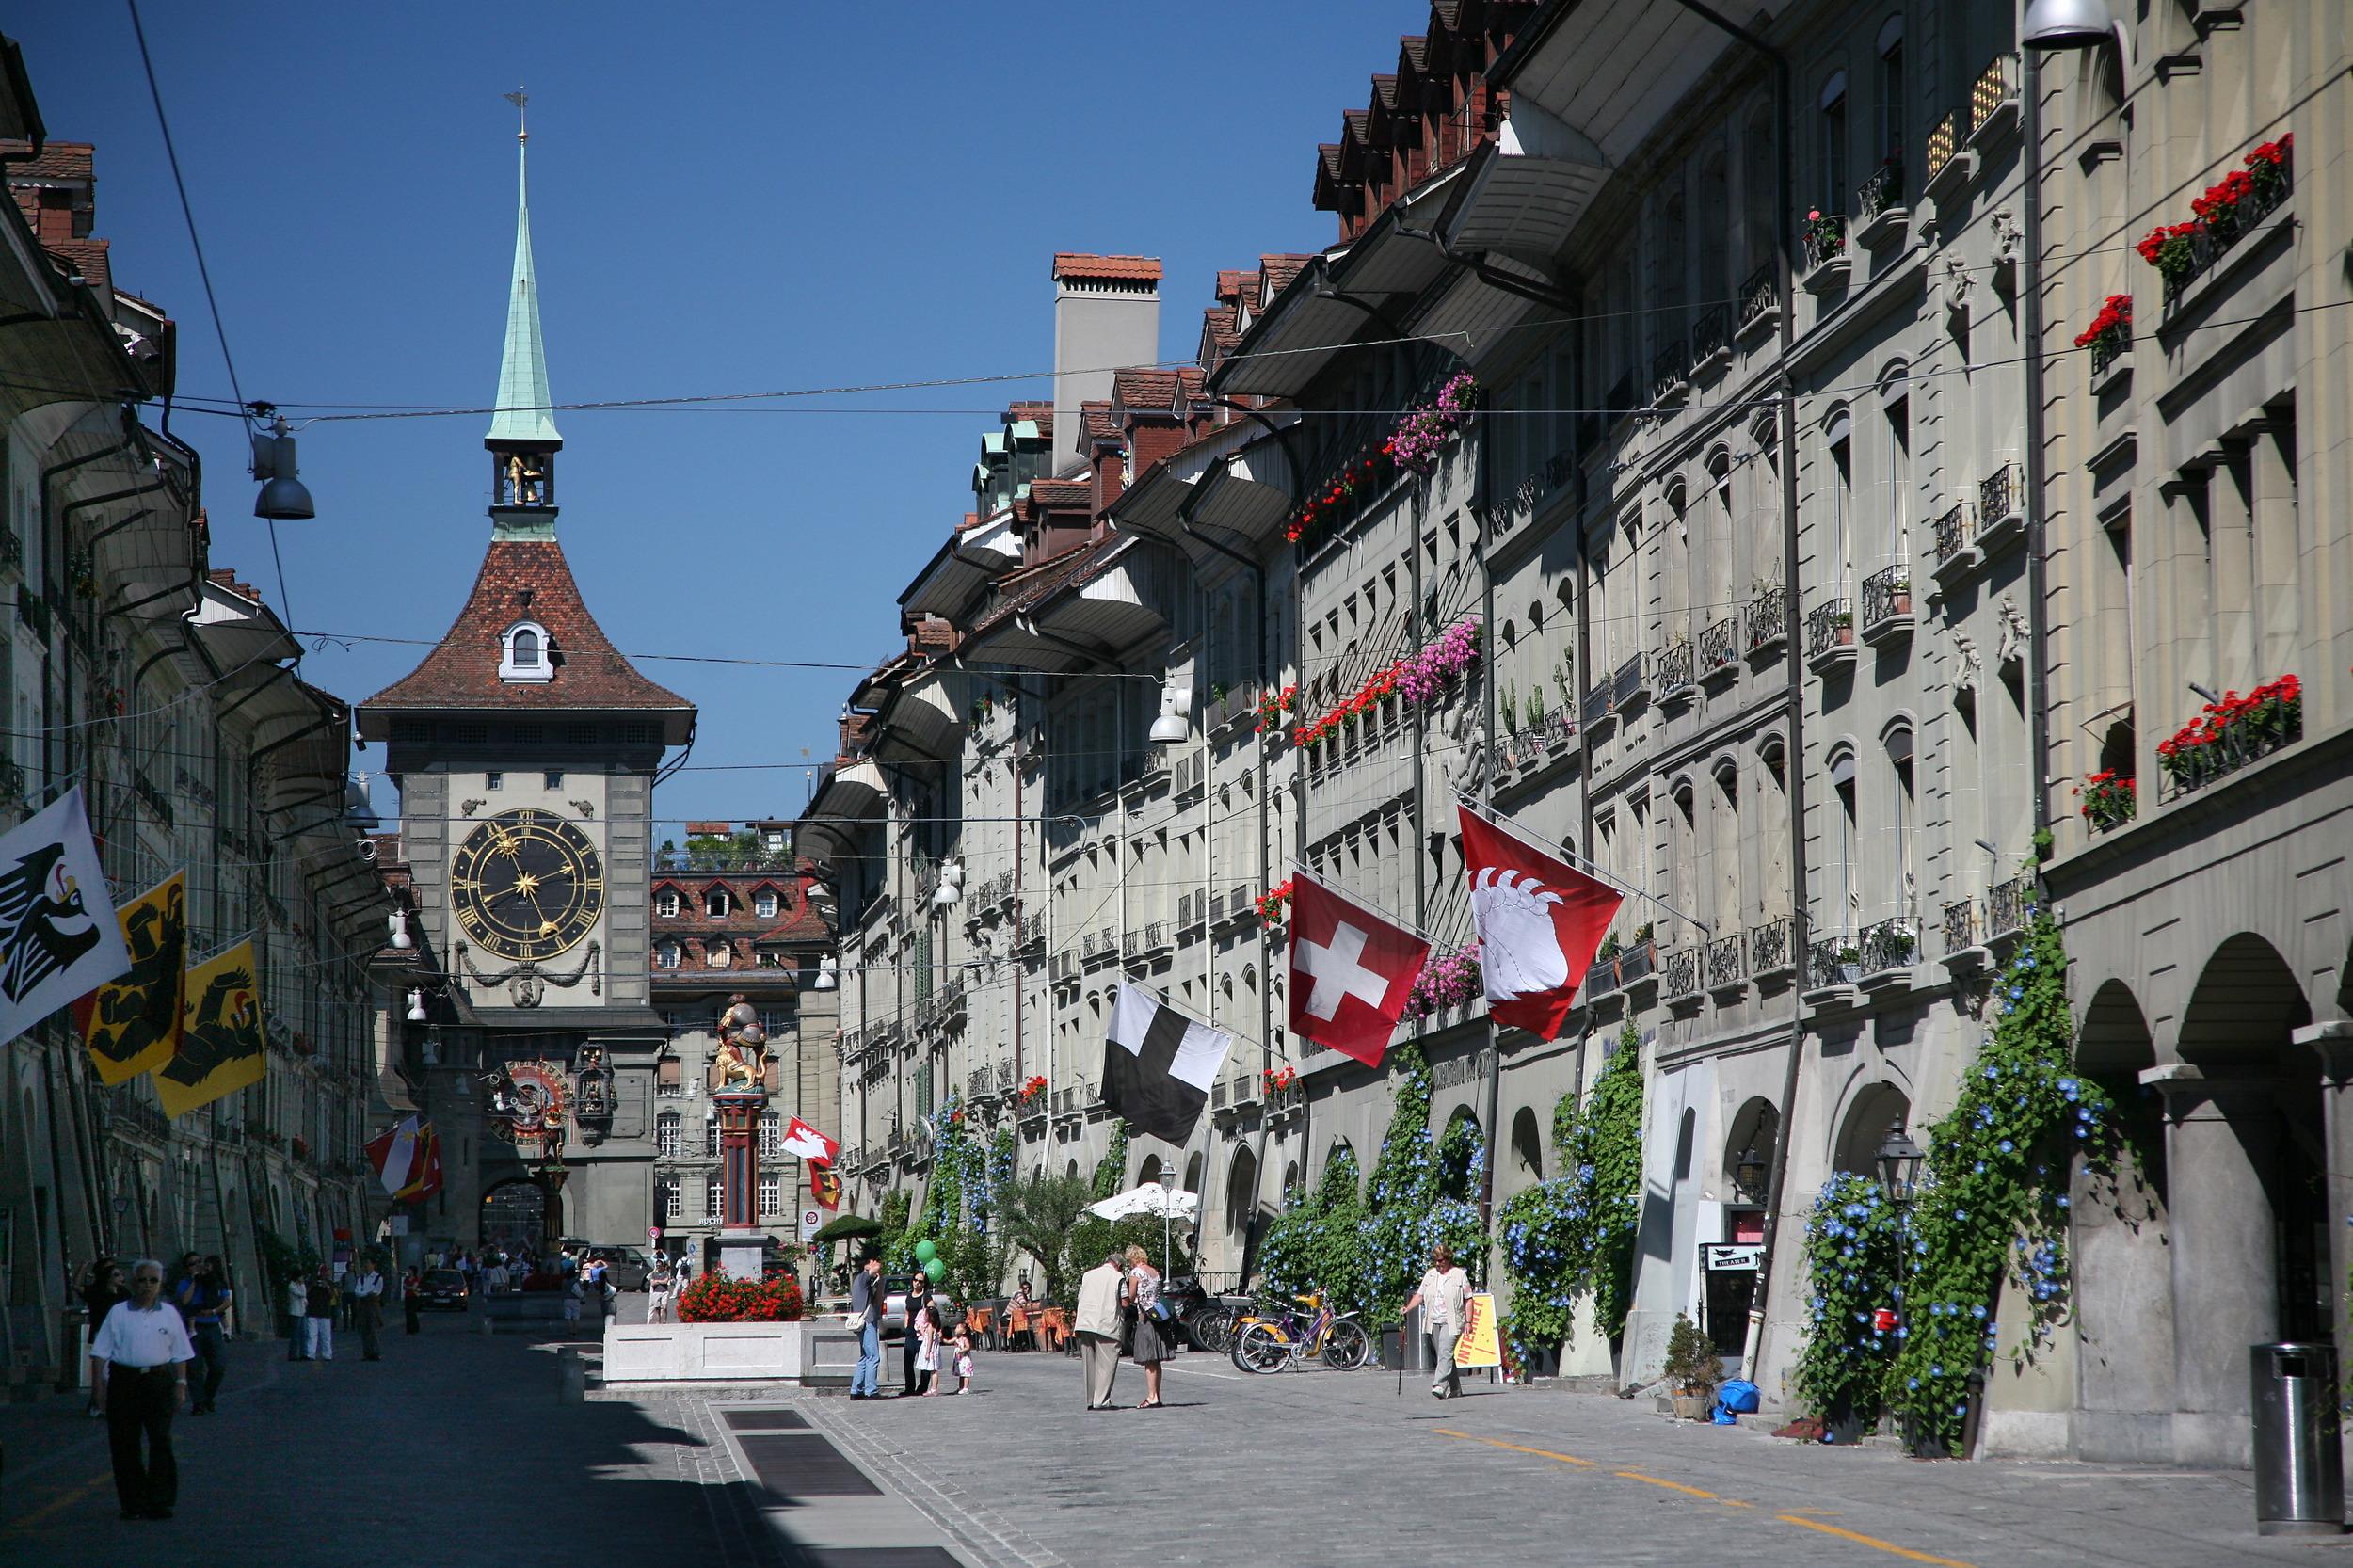 Downtown Bern